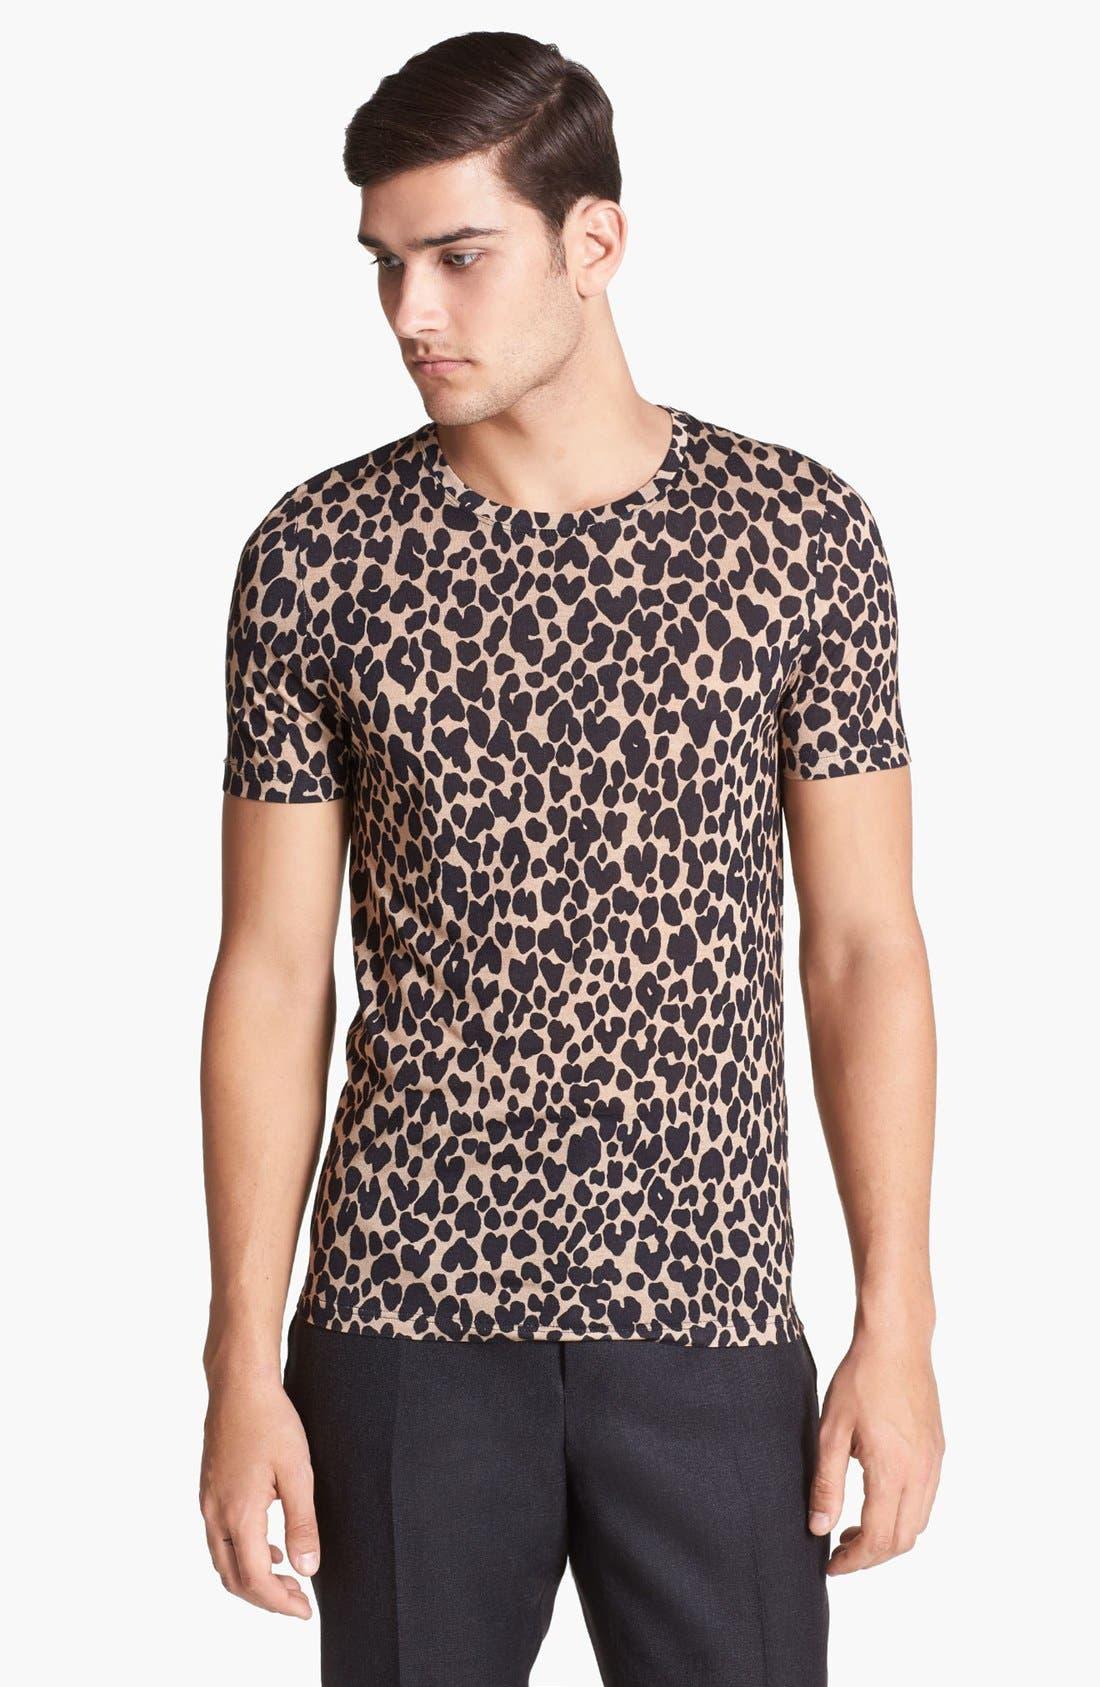 Main Image - Burberry Prorsum Leopard Print T-Shirt